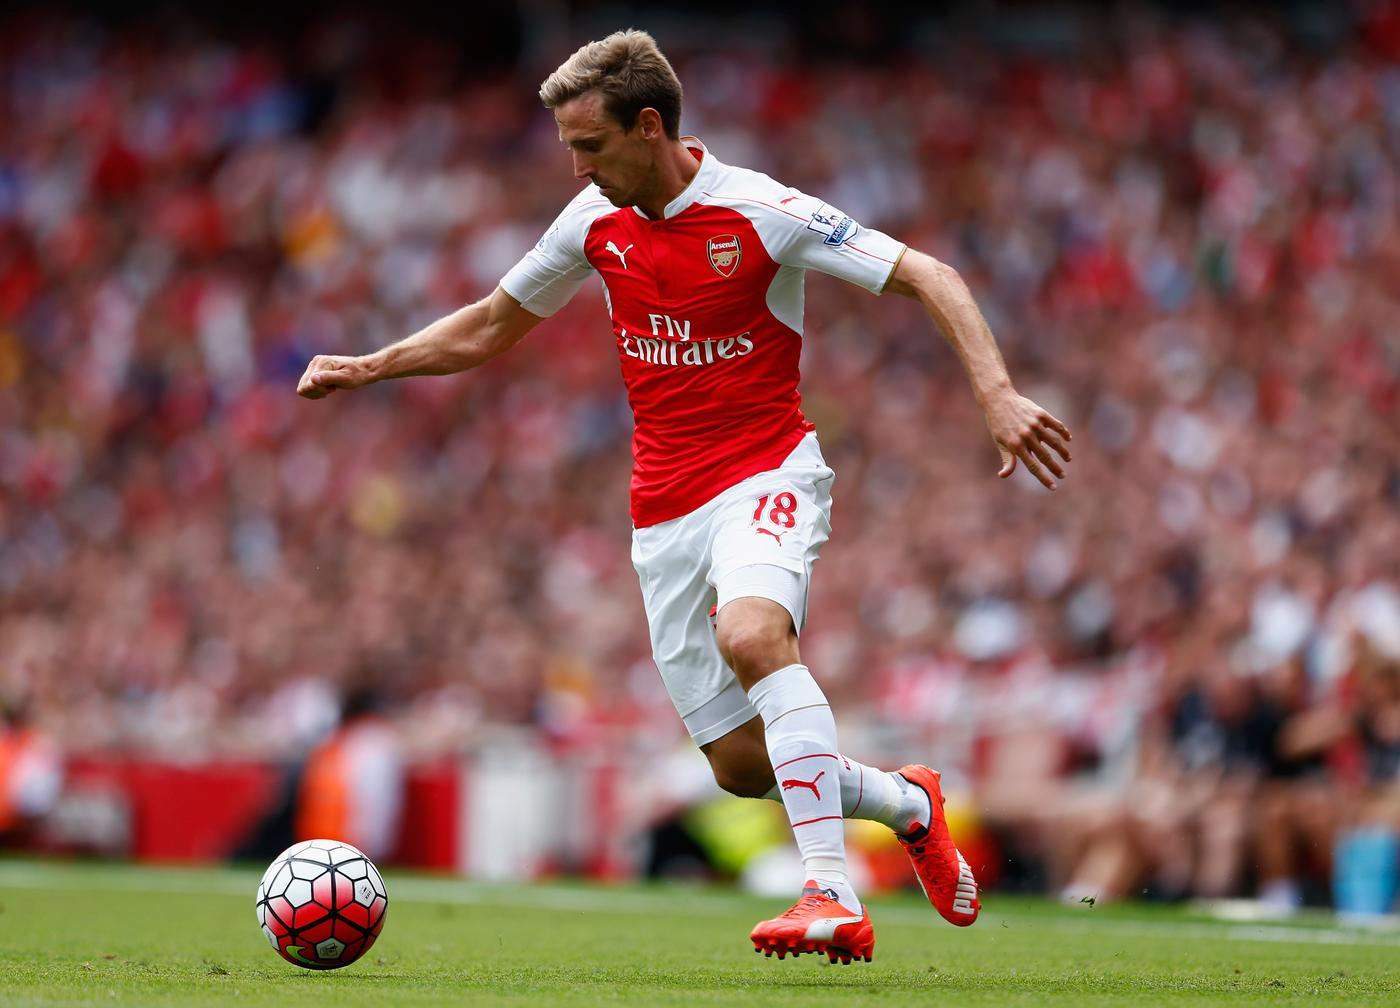 Reports: Arsene Wenger blocked Nacho Monreal's Arsenal exit to Athletic Bilbao